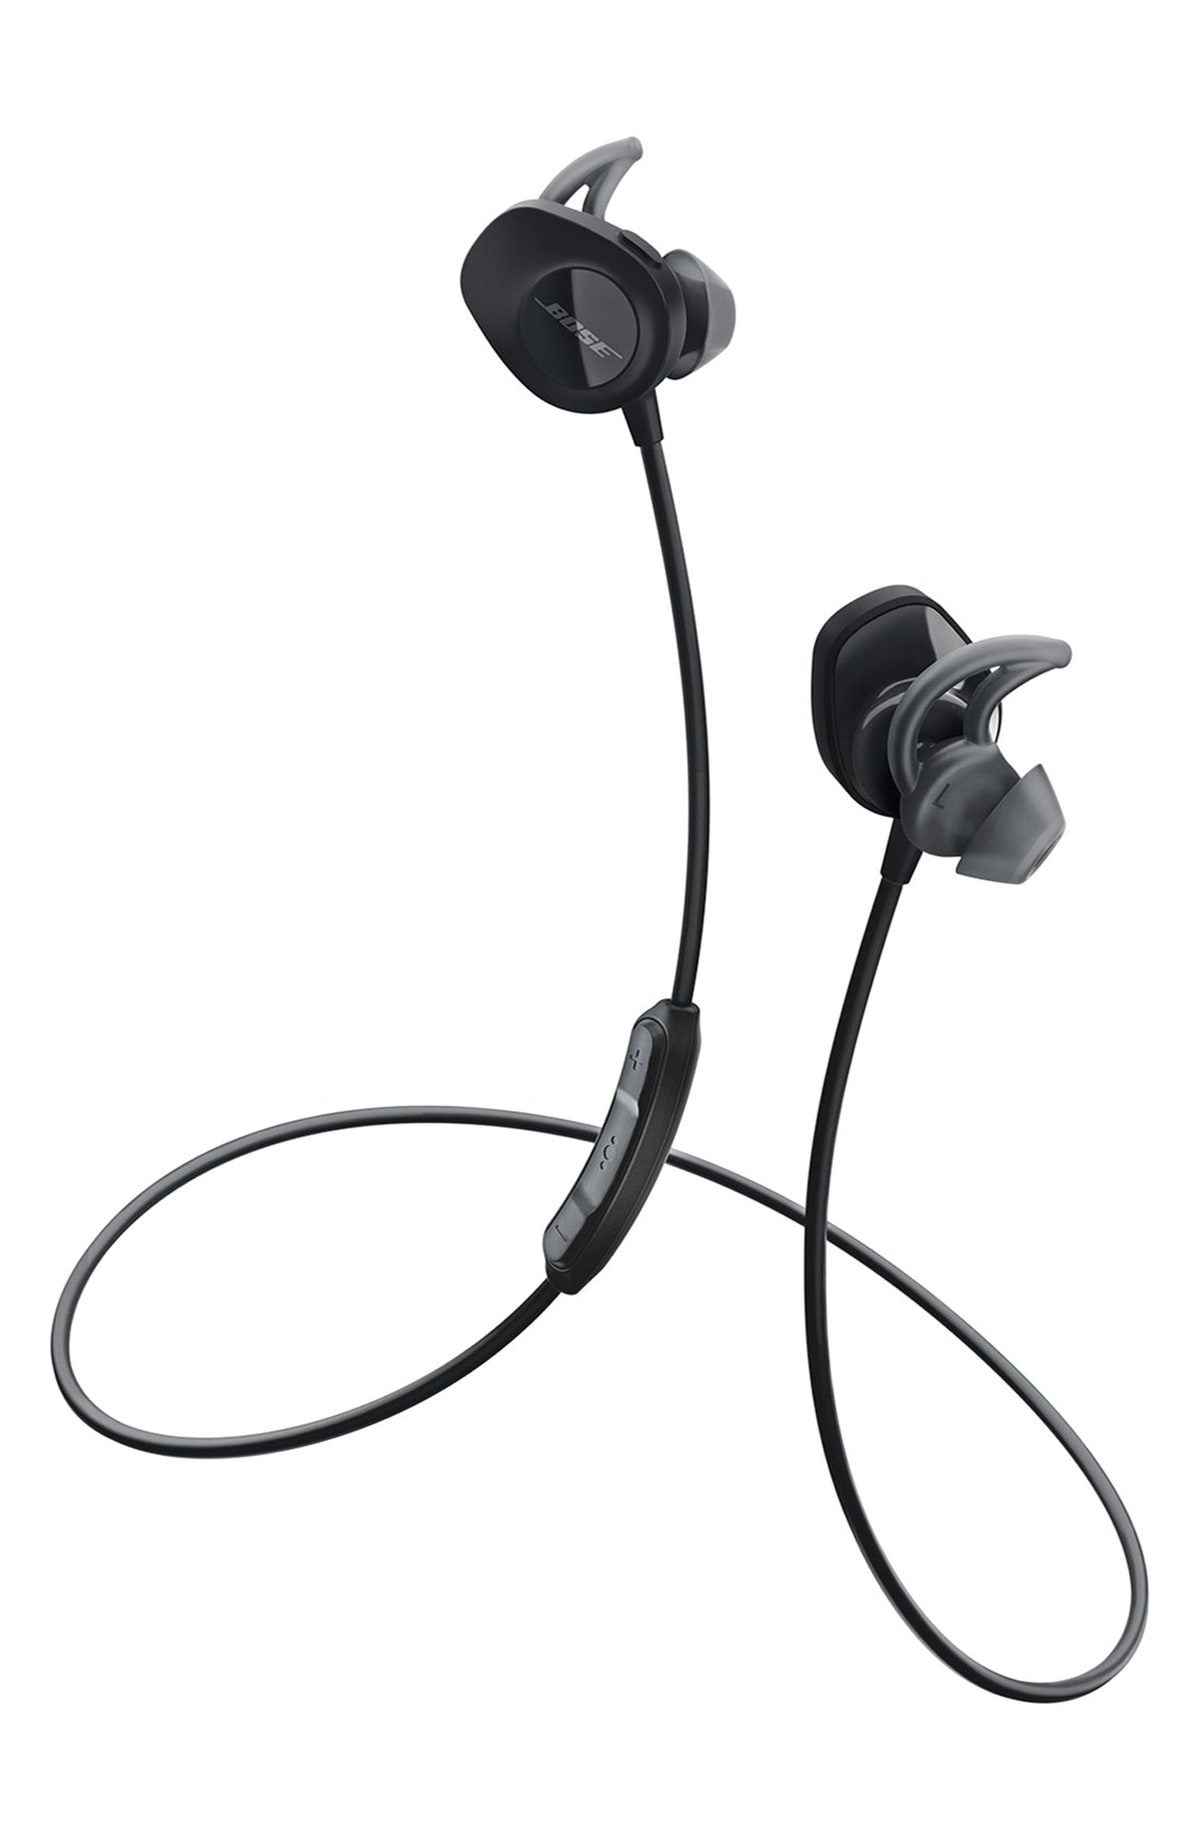 Bose Soundsport Wireless Earbuds Headphones